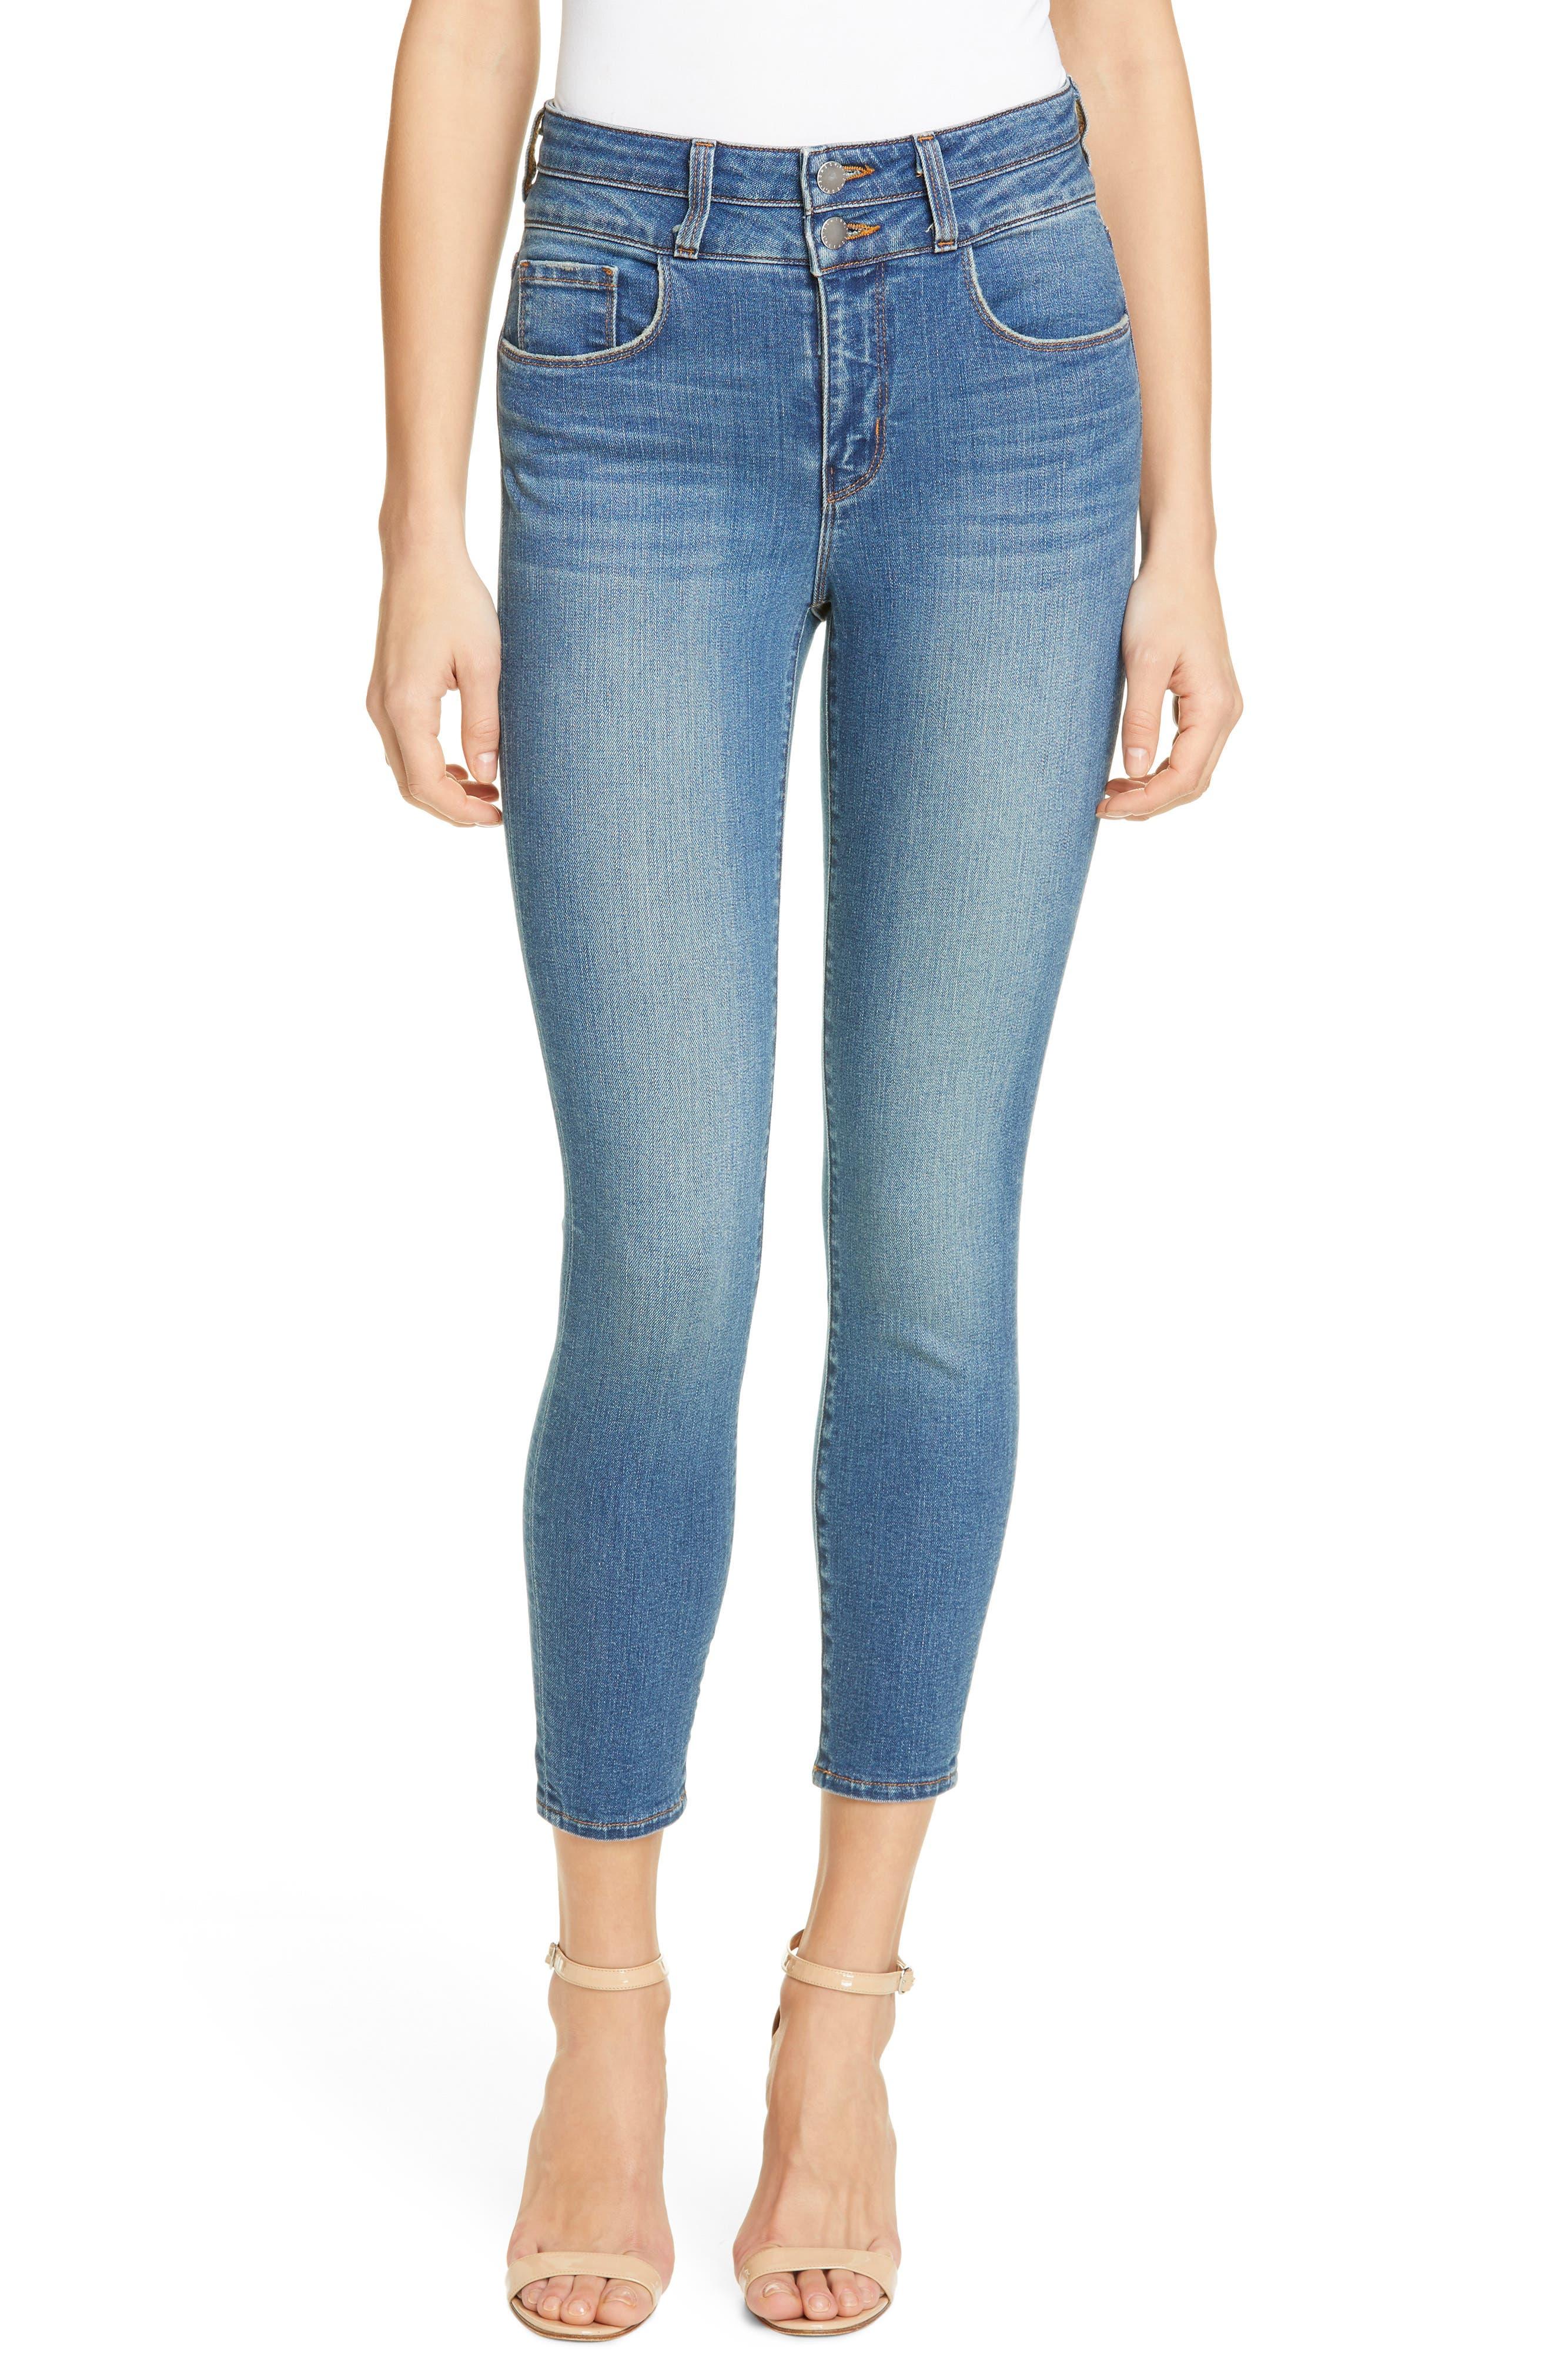 L'agence Denims Peyton High Waist Crop Skinny Jeans